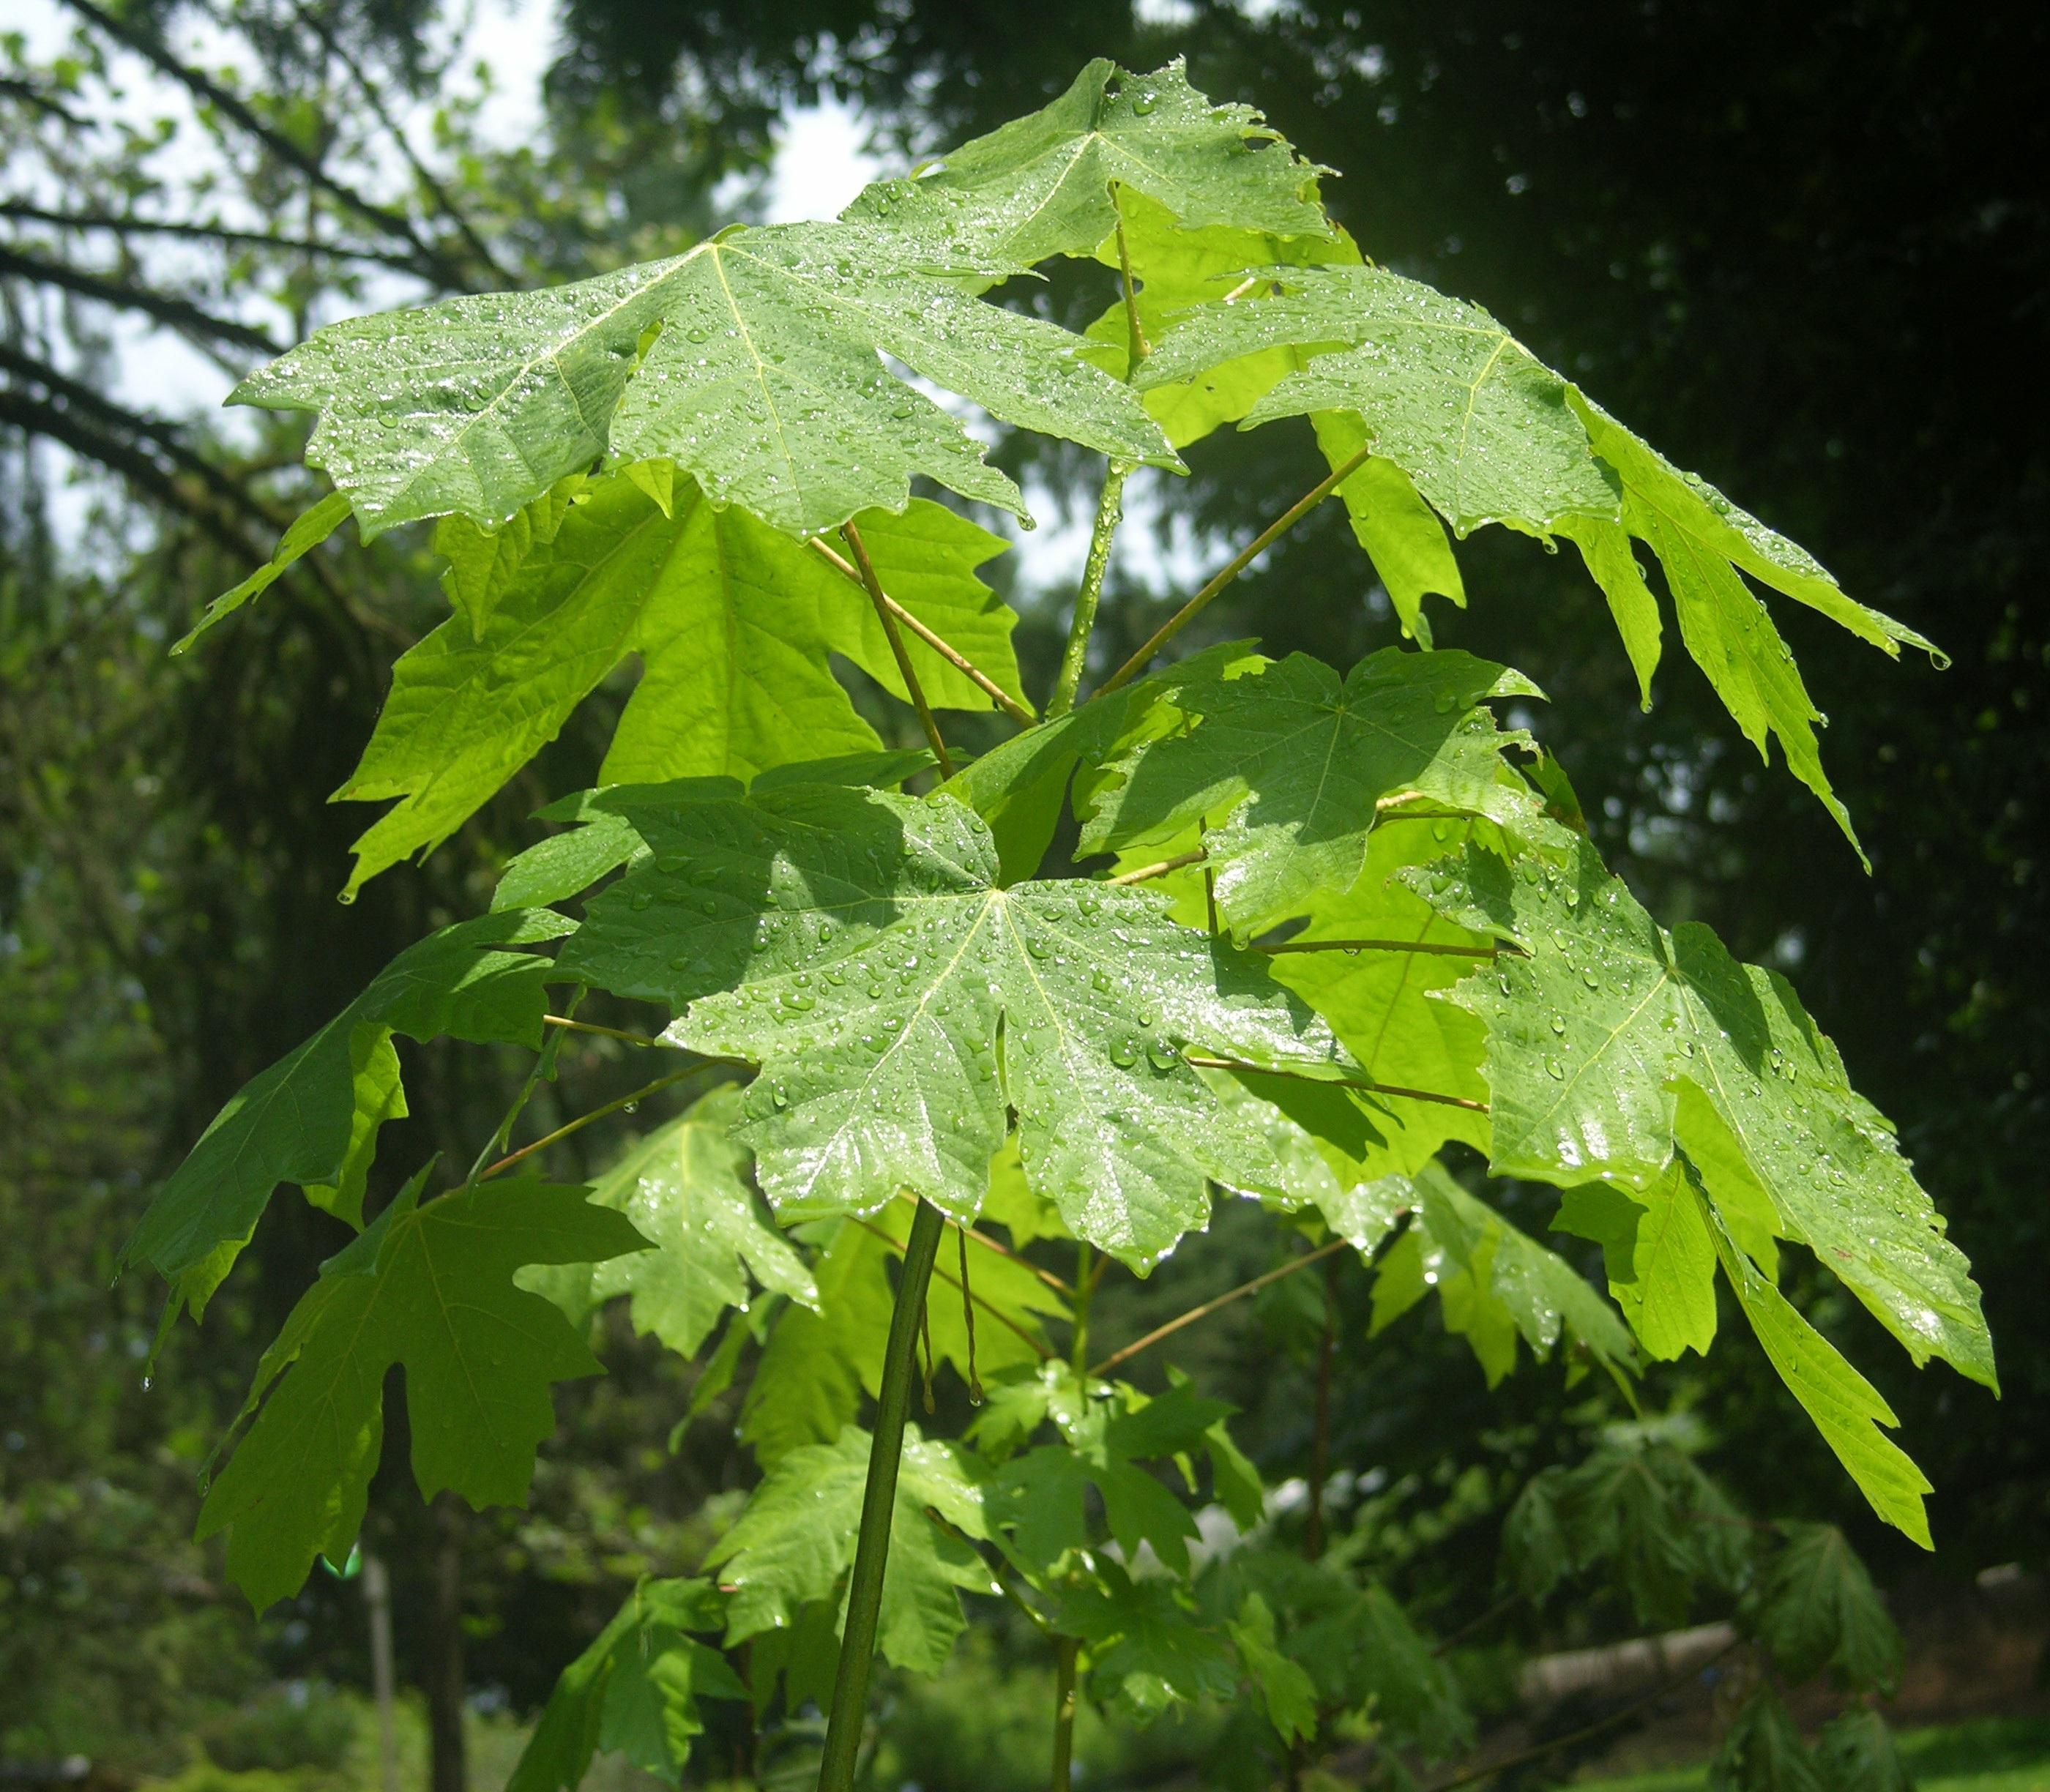 Big-Leaf Maple (Acer macrophyllum), Pacific northwest native tree on